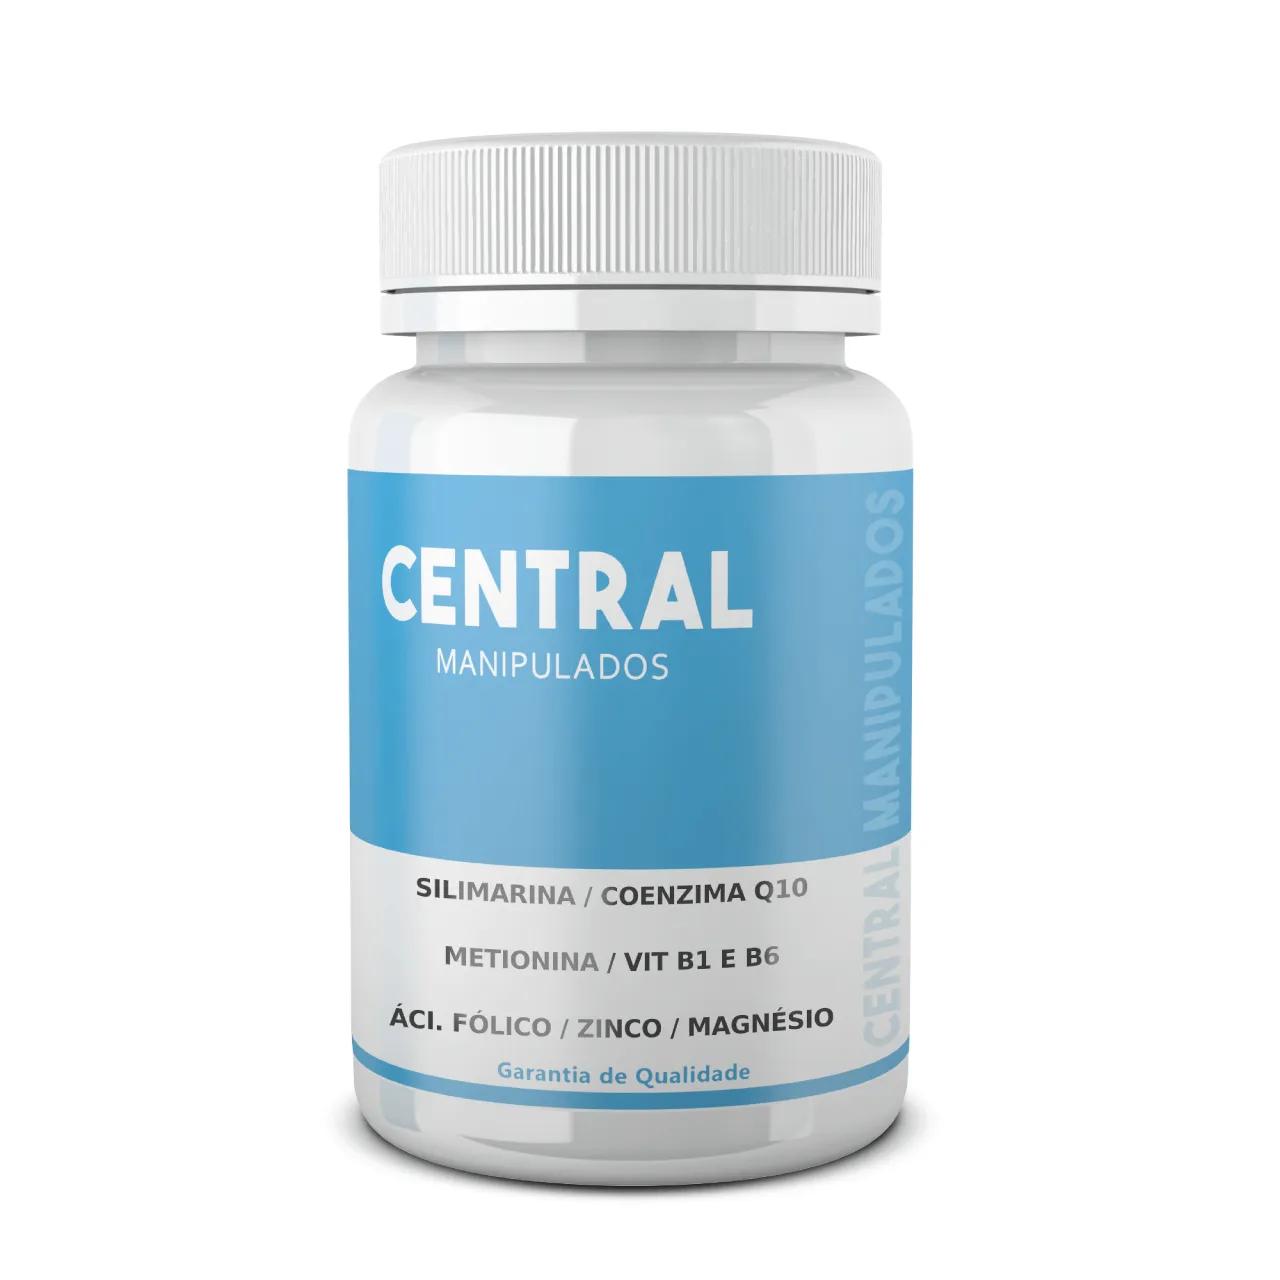 Silimarina 200mg + Coenzima Q10 Ubiquinona 50mg + Metionina 100mg +  Vitamina B1 5mg + B6 10mg + Ácido Fólico 1mg + Zinco 10mg + Magnésio 115mg - 60 cápsulas